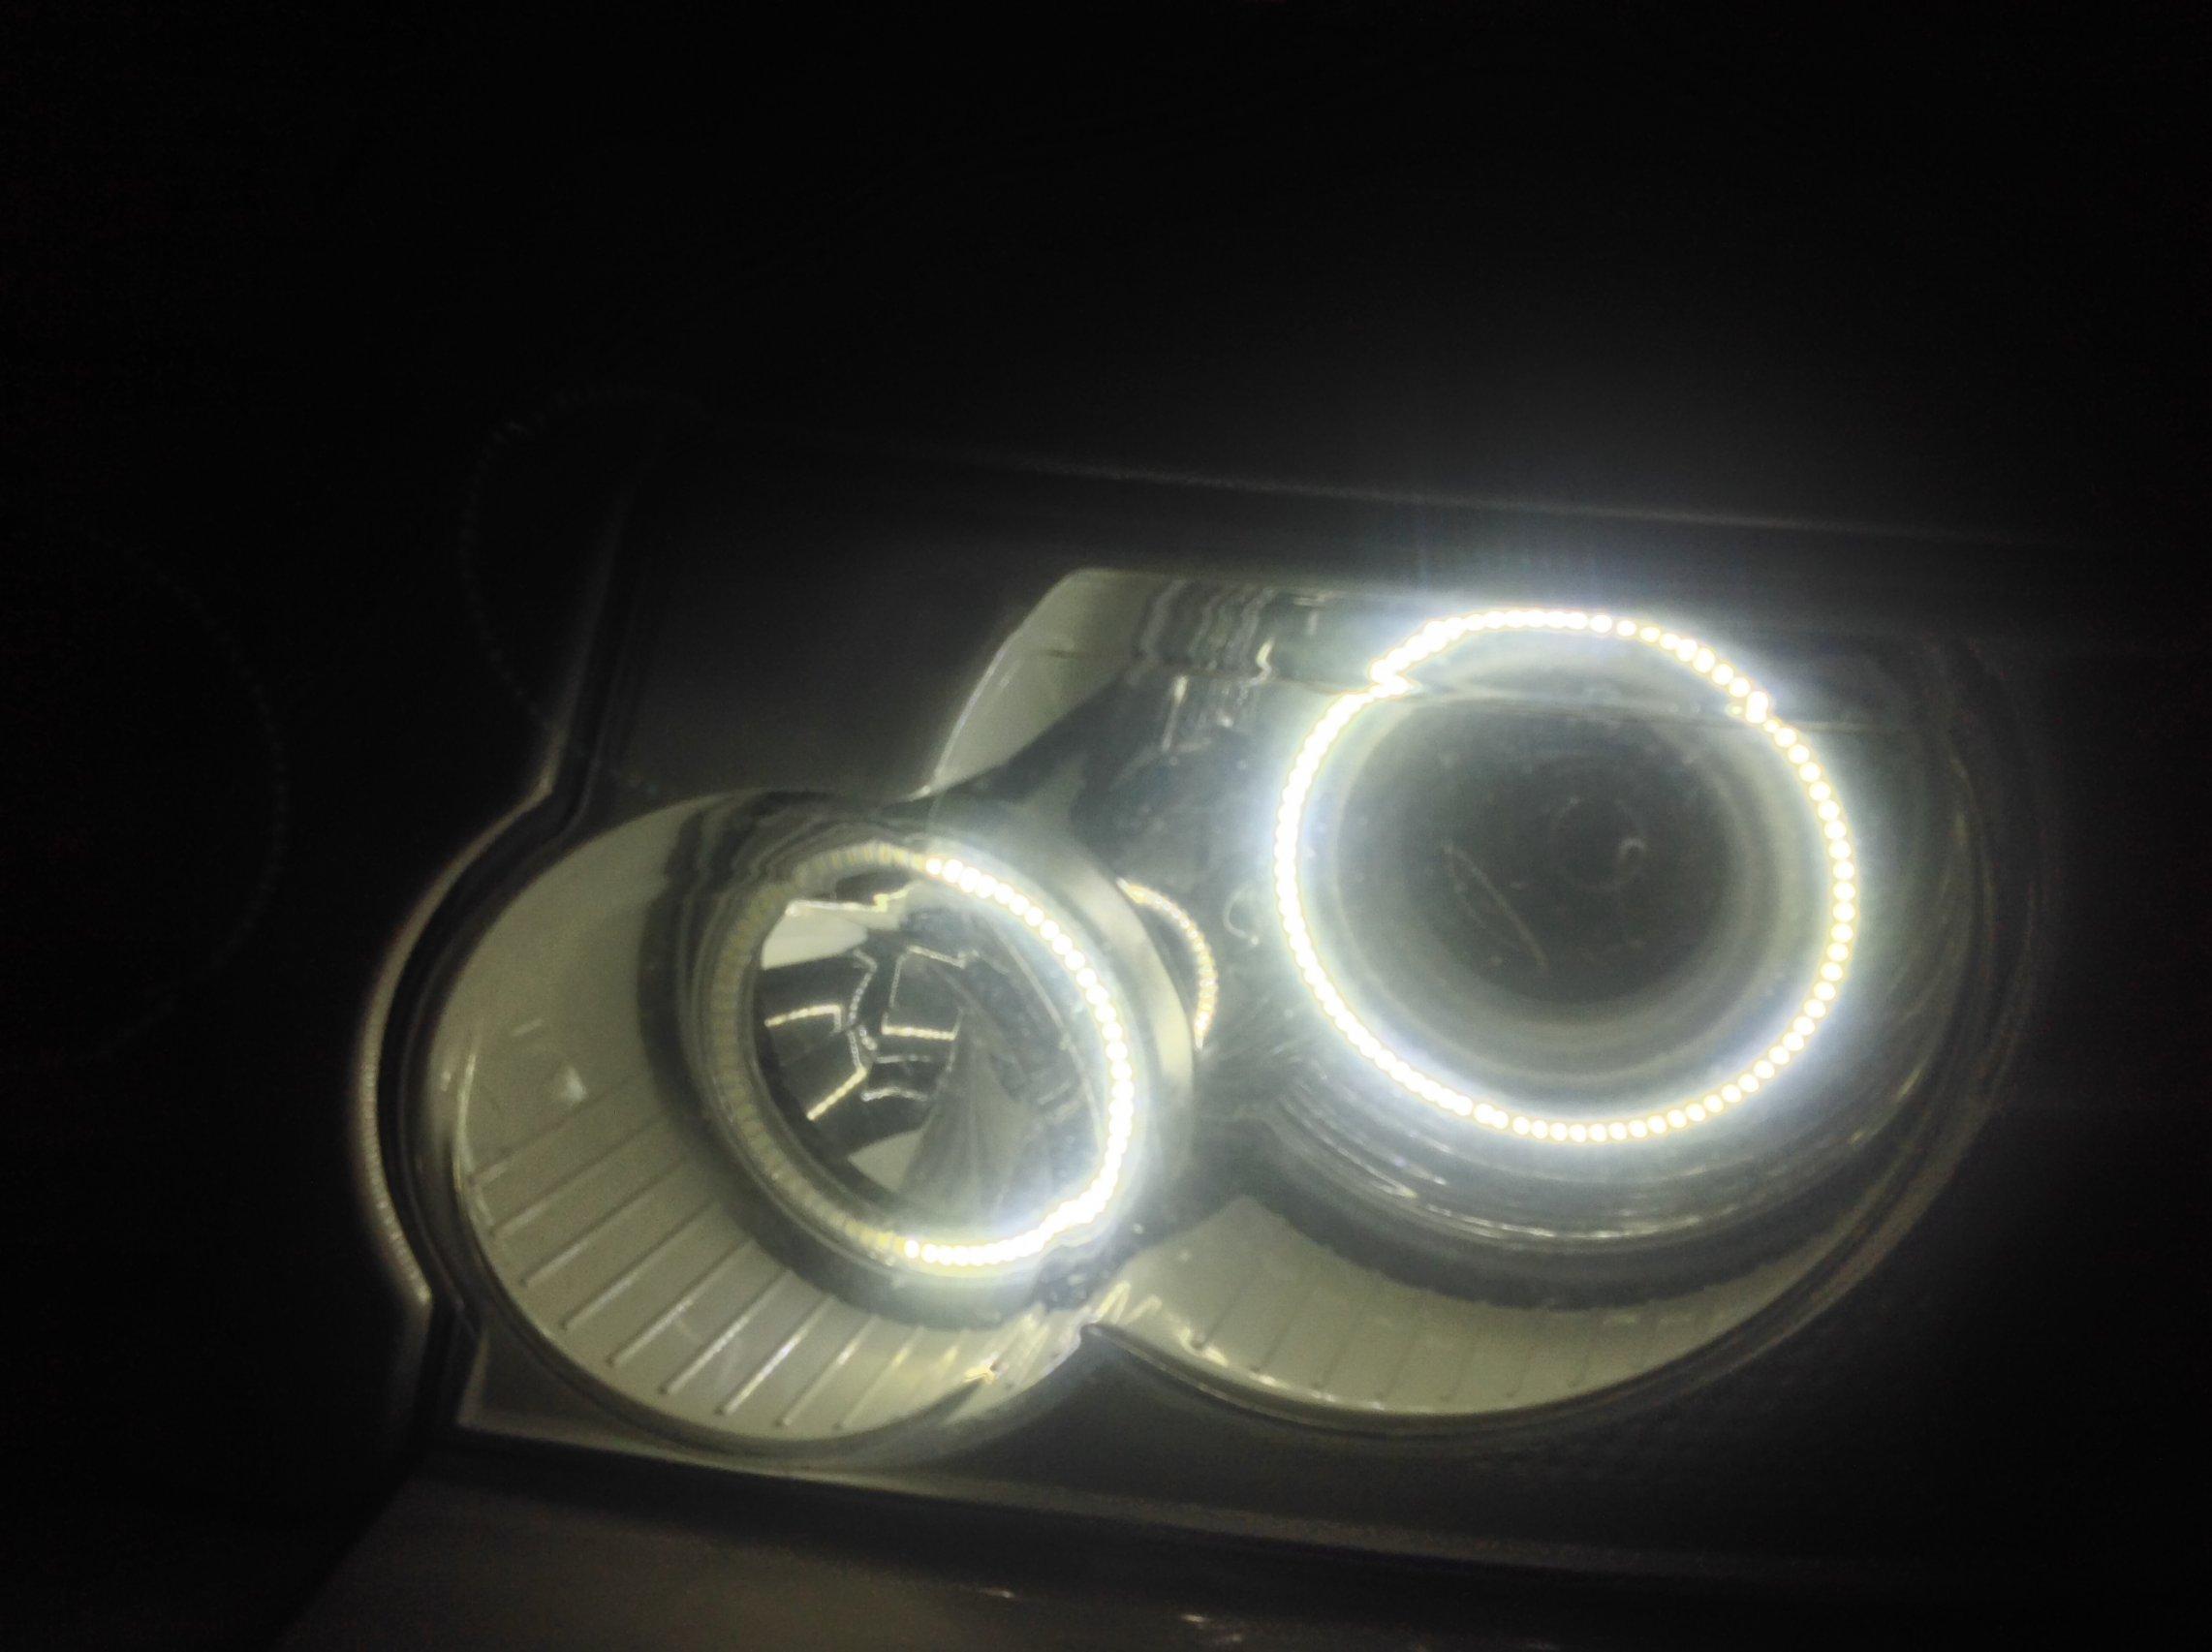 How to install halos or paint headlight bezels pics-img_0086.jpg